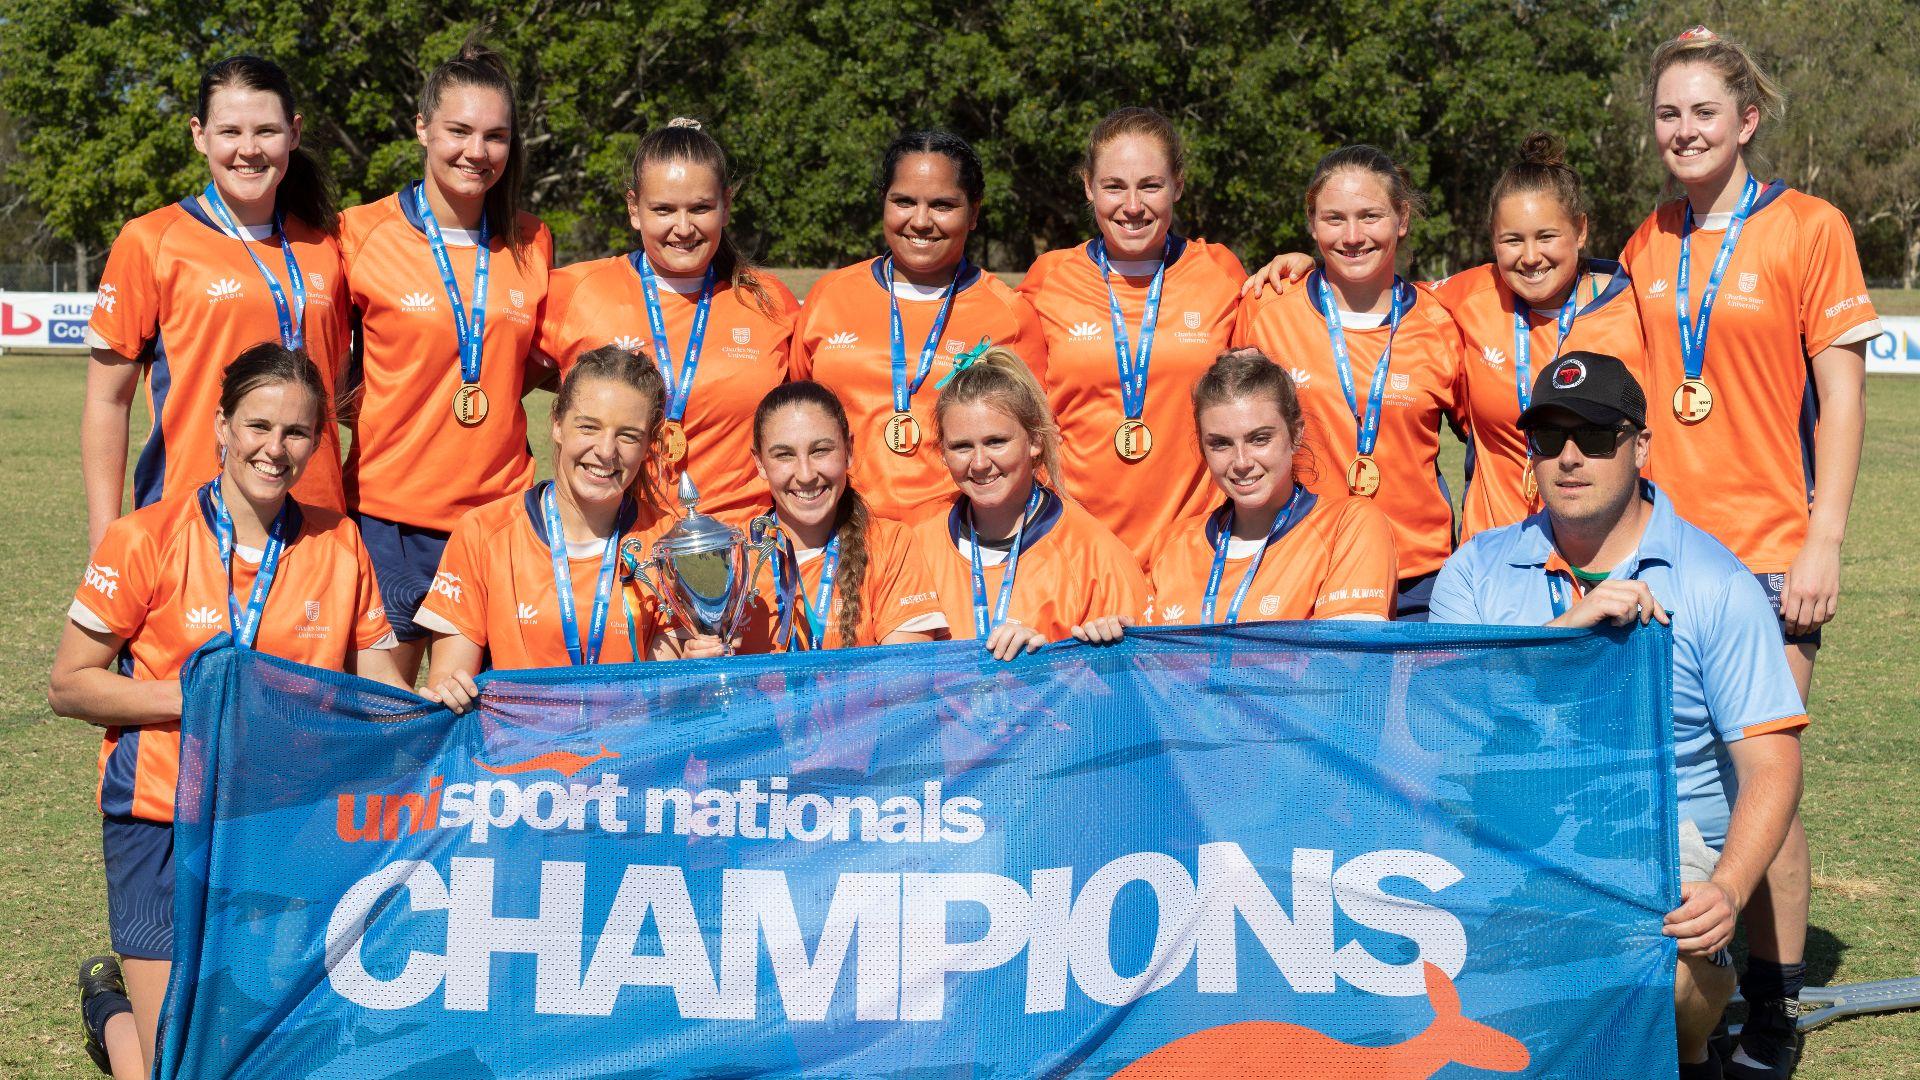 Elite Athlete Program students excel at UniSport Australia Nationals competition